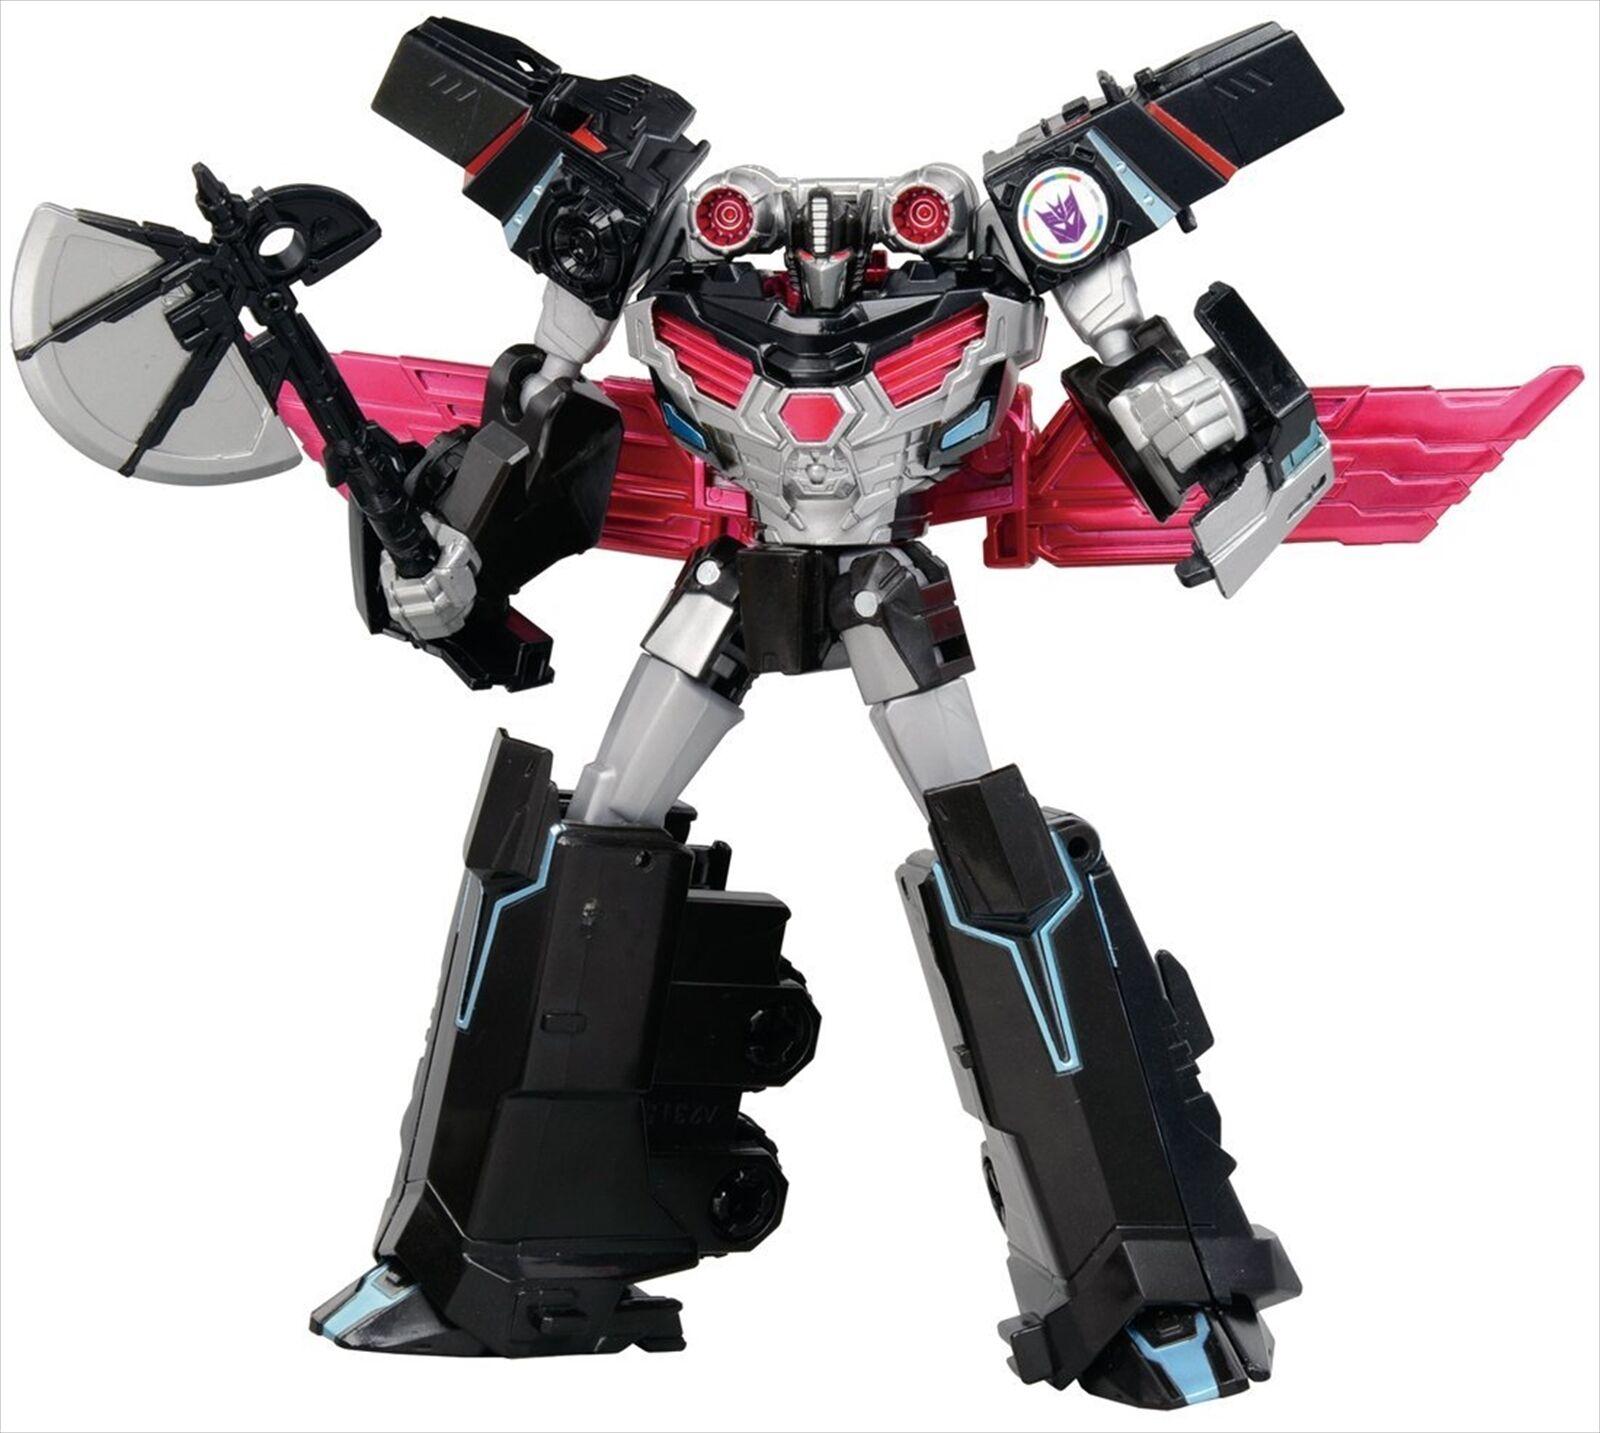 Takara Tomy Transformer Adventure TAV56 Nemesis Prime Figure